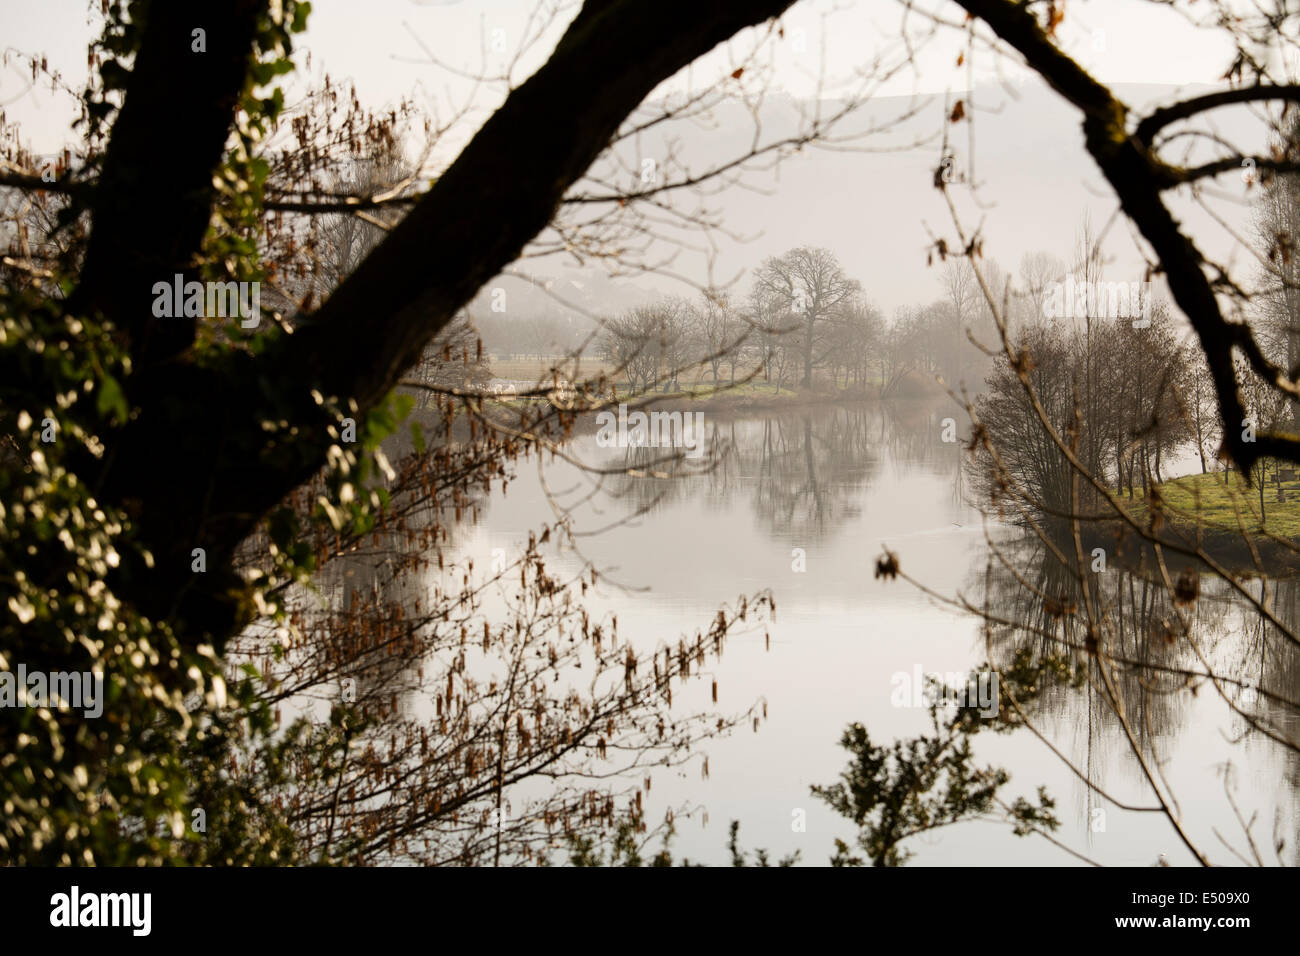 Dourdou river Conques France - Stock Image